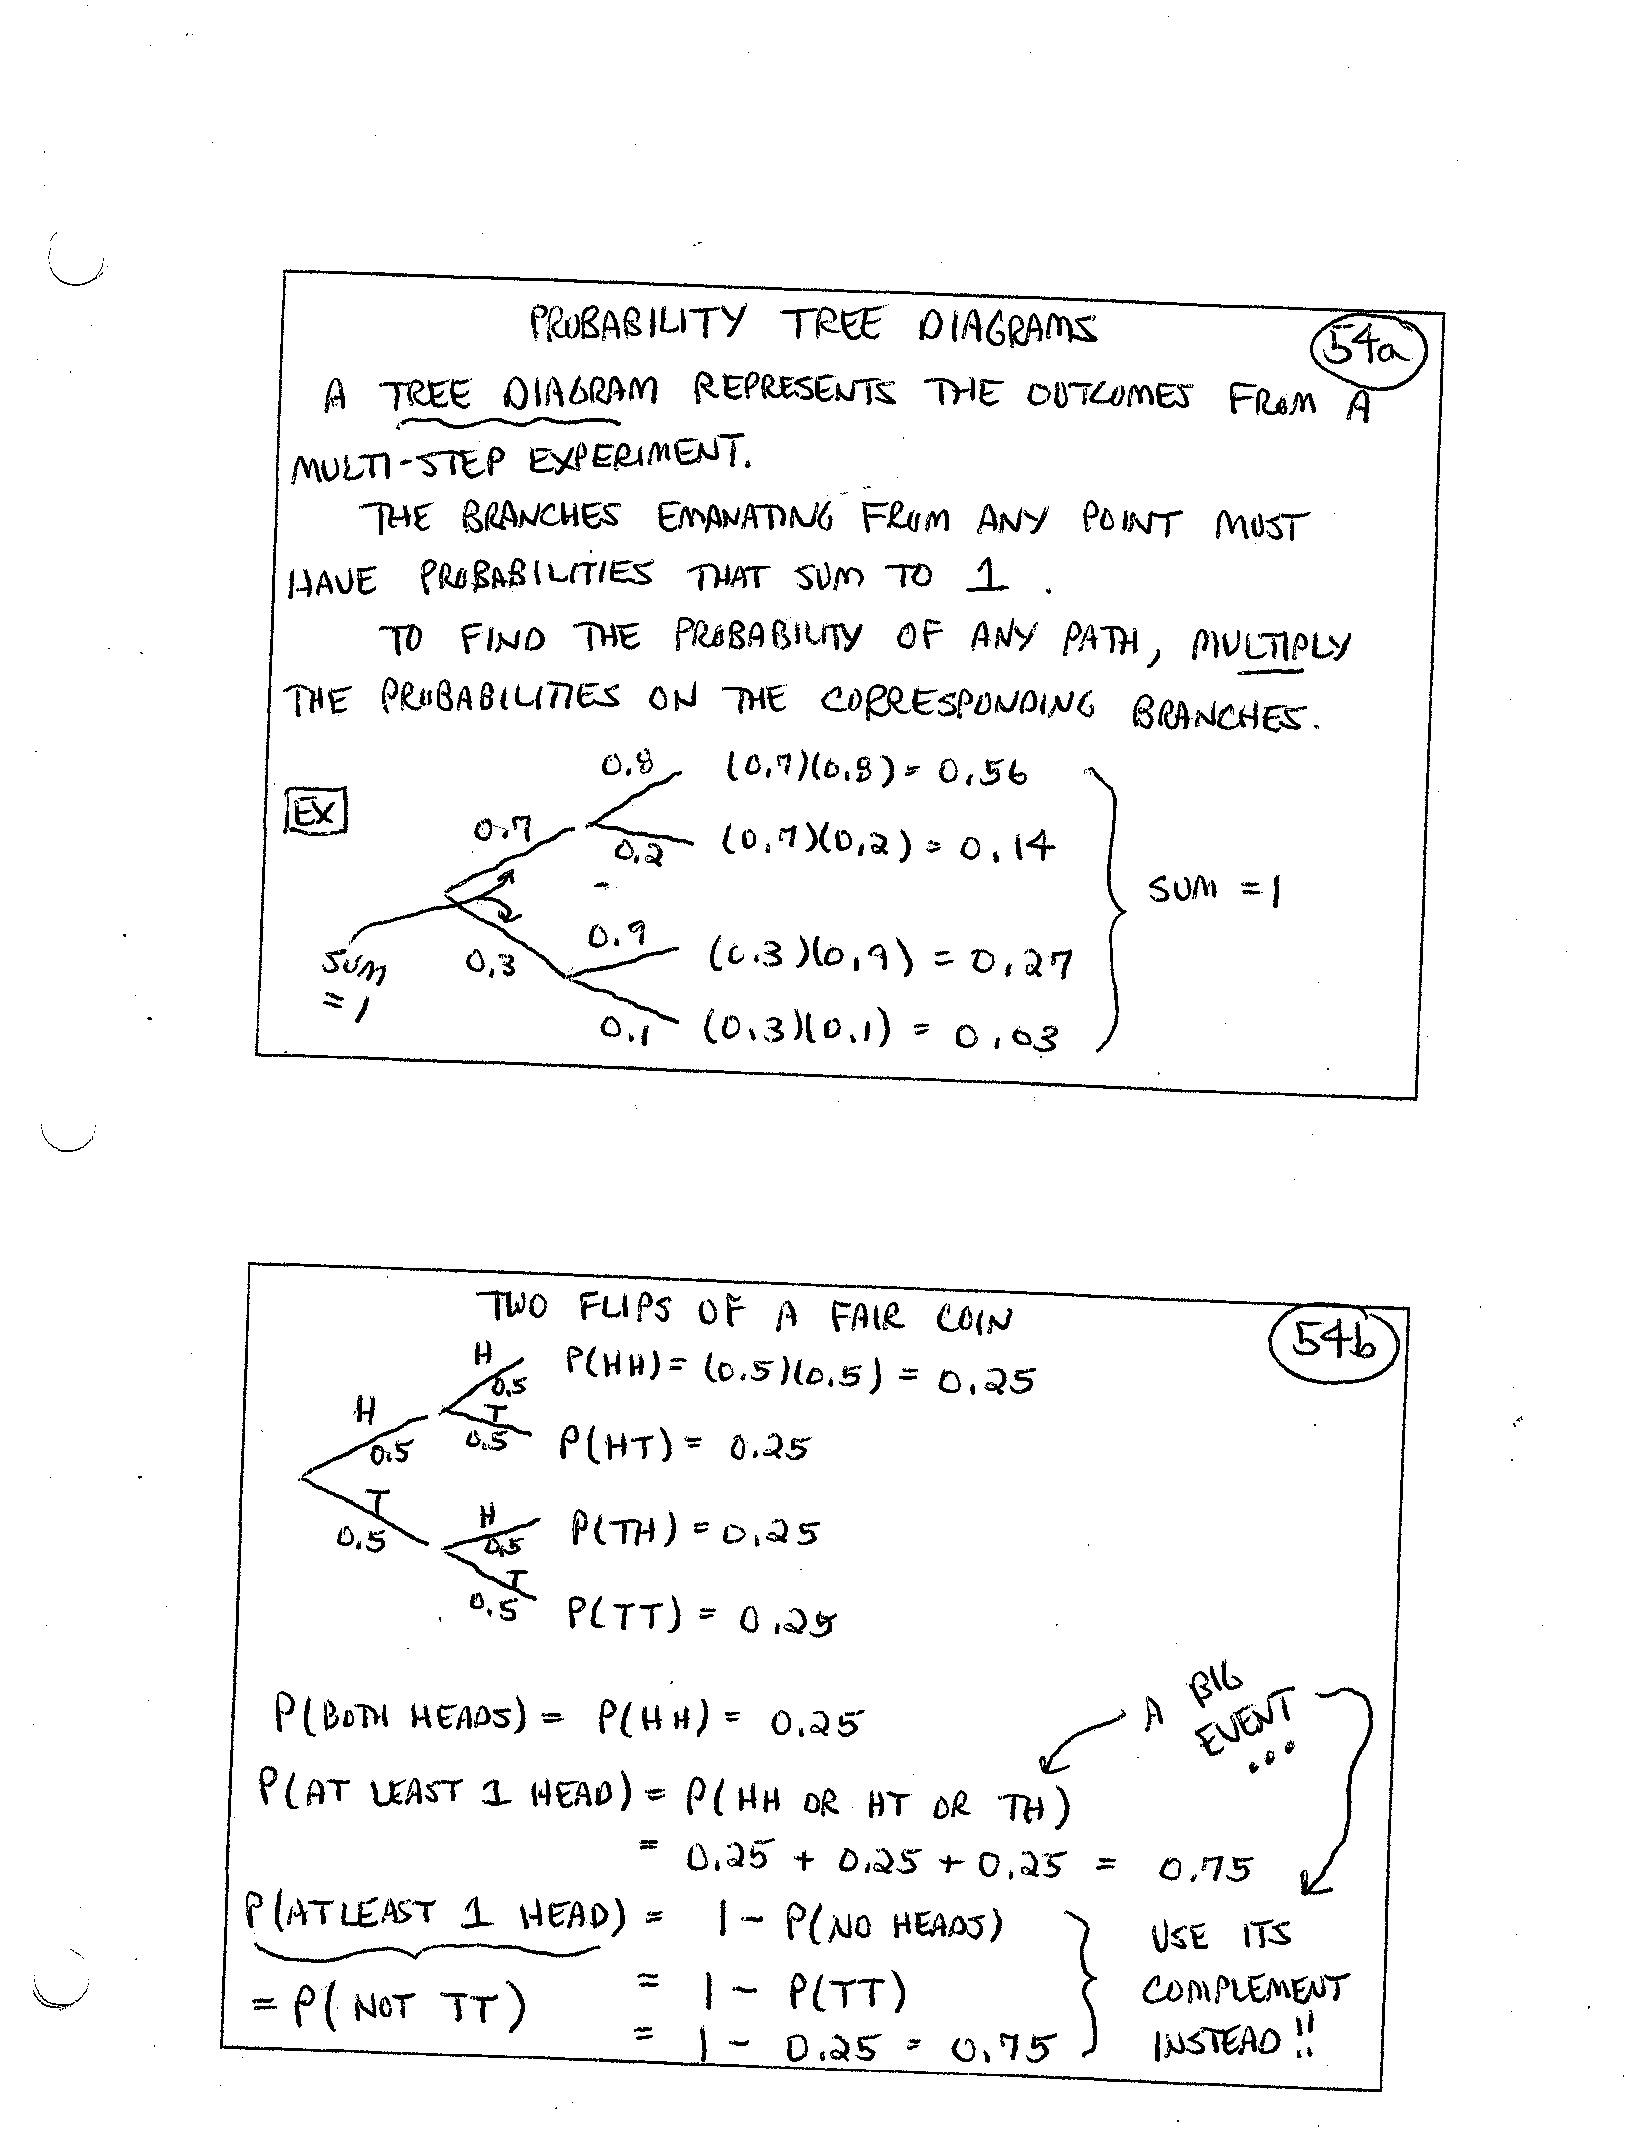 tree diagram worksheets grade 4 wiring for ibanez blazer guitar worksheet probability grass fedjp